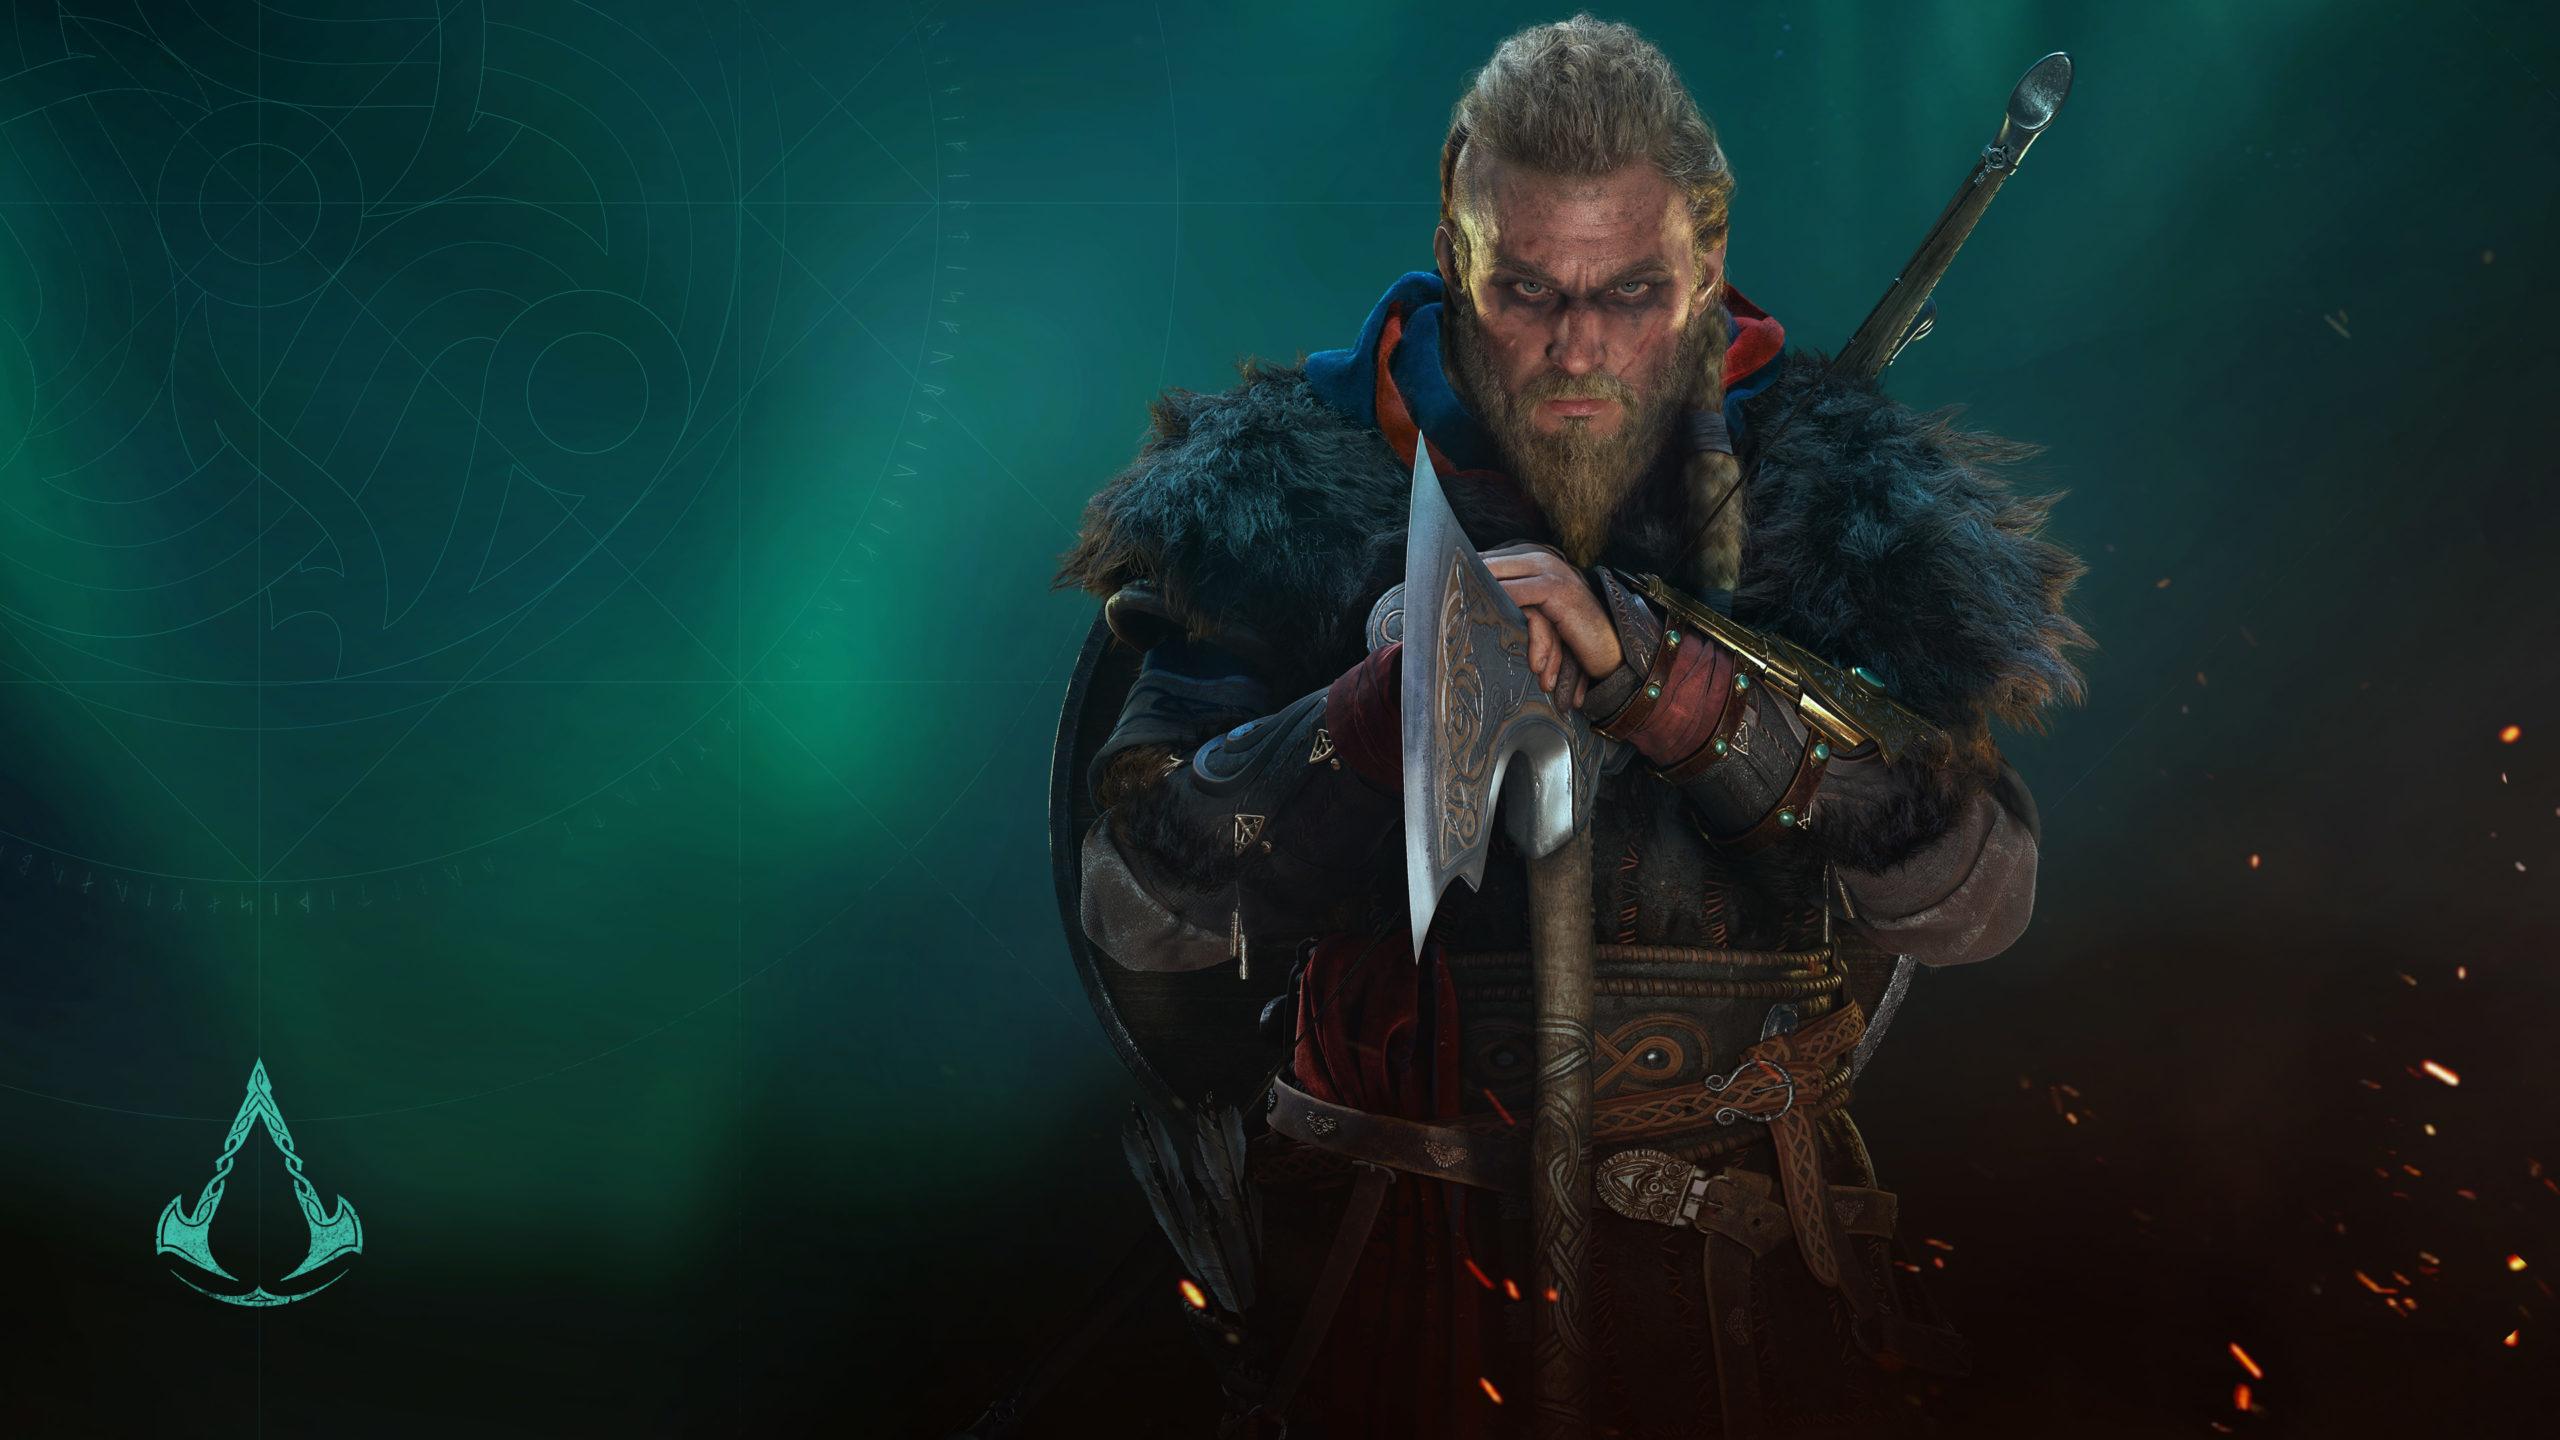 Photo of Ubisoft تنفي شائعات إضافة بطل في اللحظات الأخيرة للعبة Assassin's Creed Valhalla